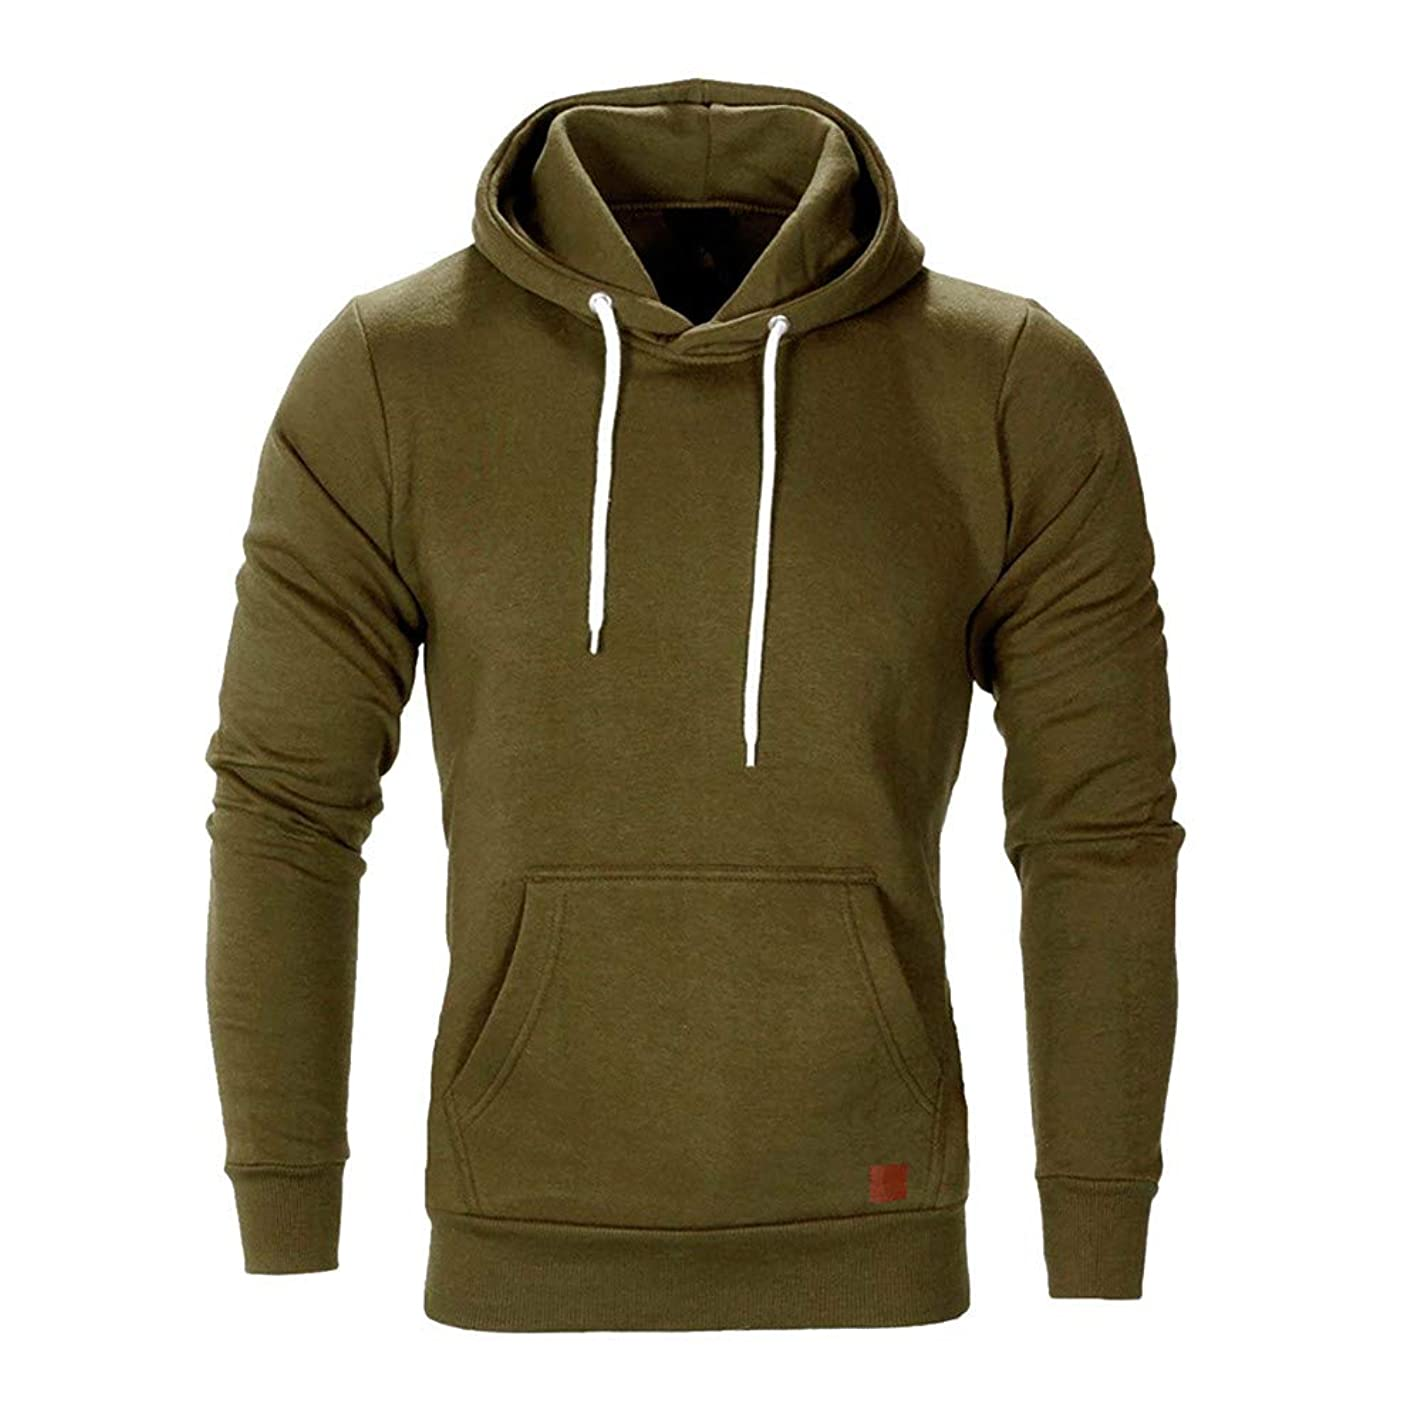 Sunhusing Men Autumn Winter Long Sleeve Casual Sweatshirt Hoodies Solid Color Tracksuits